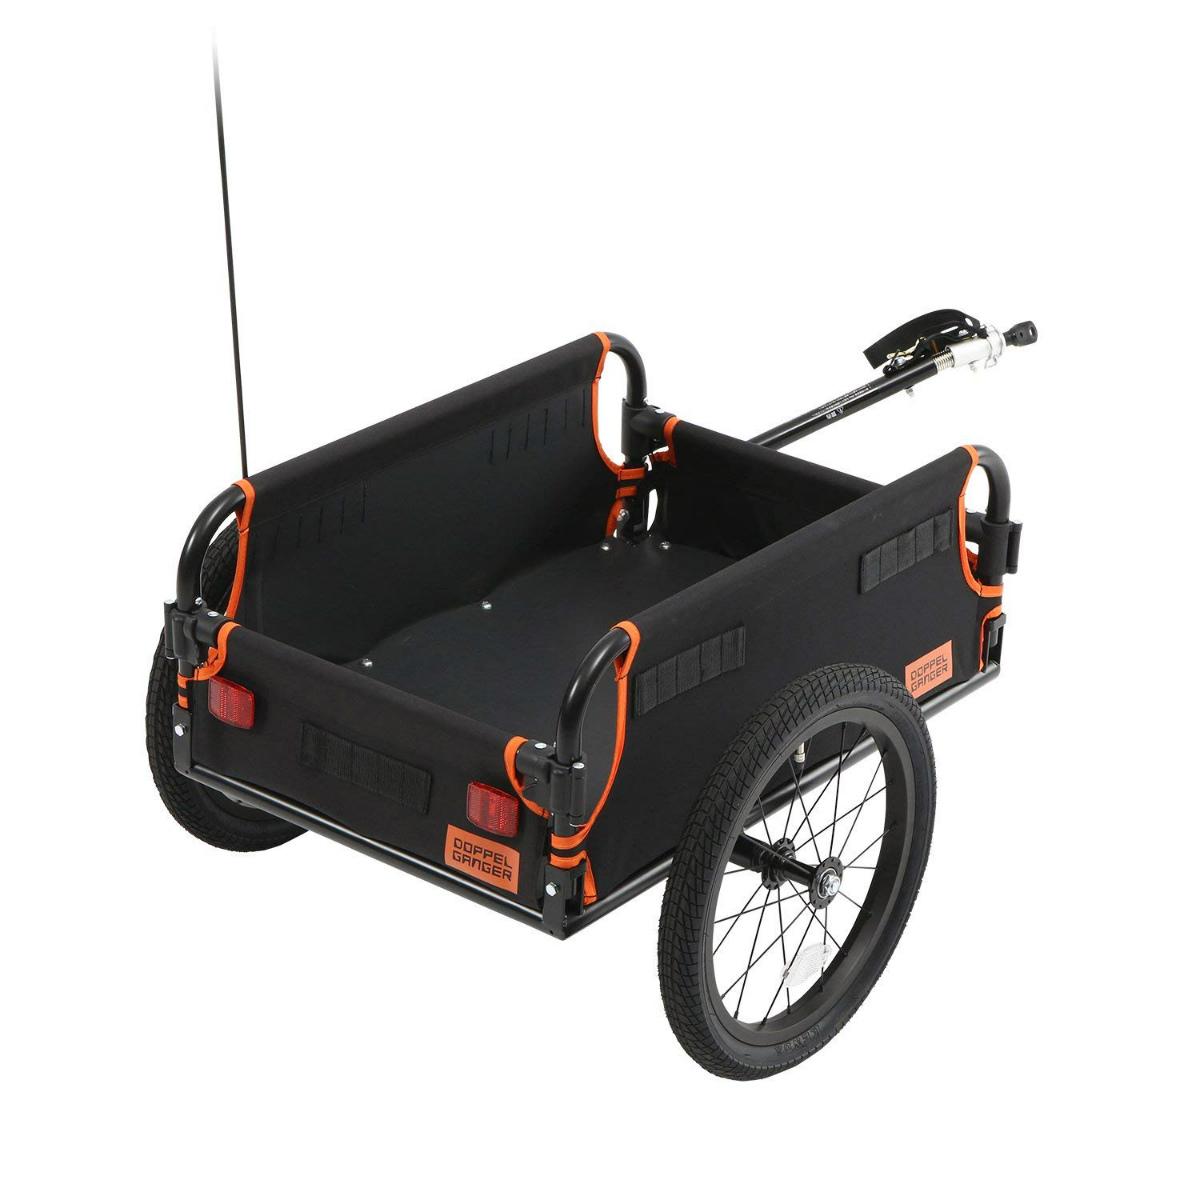 DOPPELGANGER マルチユースサイクルトレーラー | DCR434-DP | 自転車用 | 積載重量65L | ドッペルギャンガー